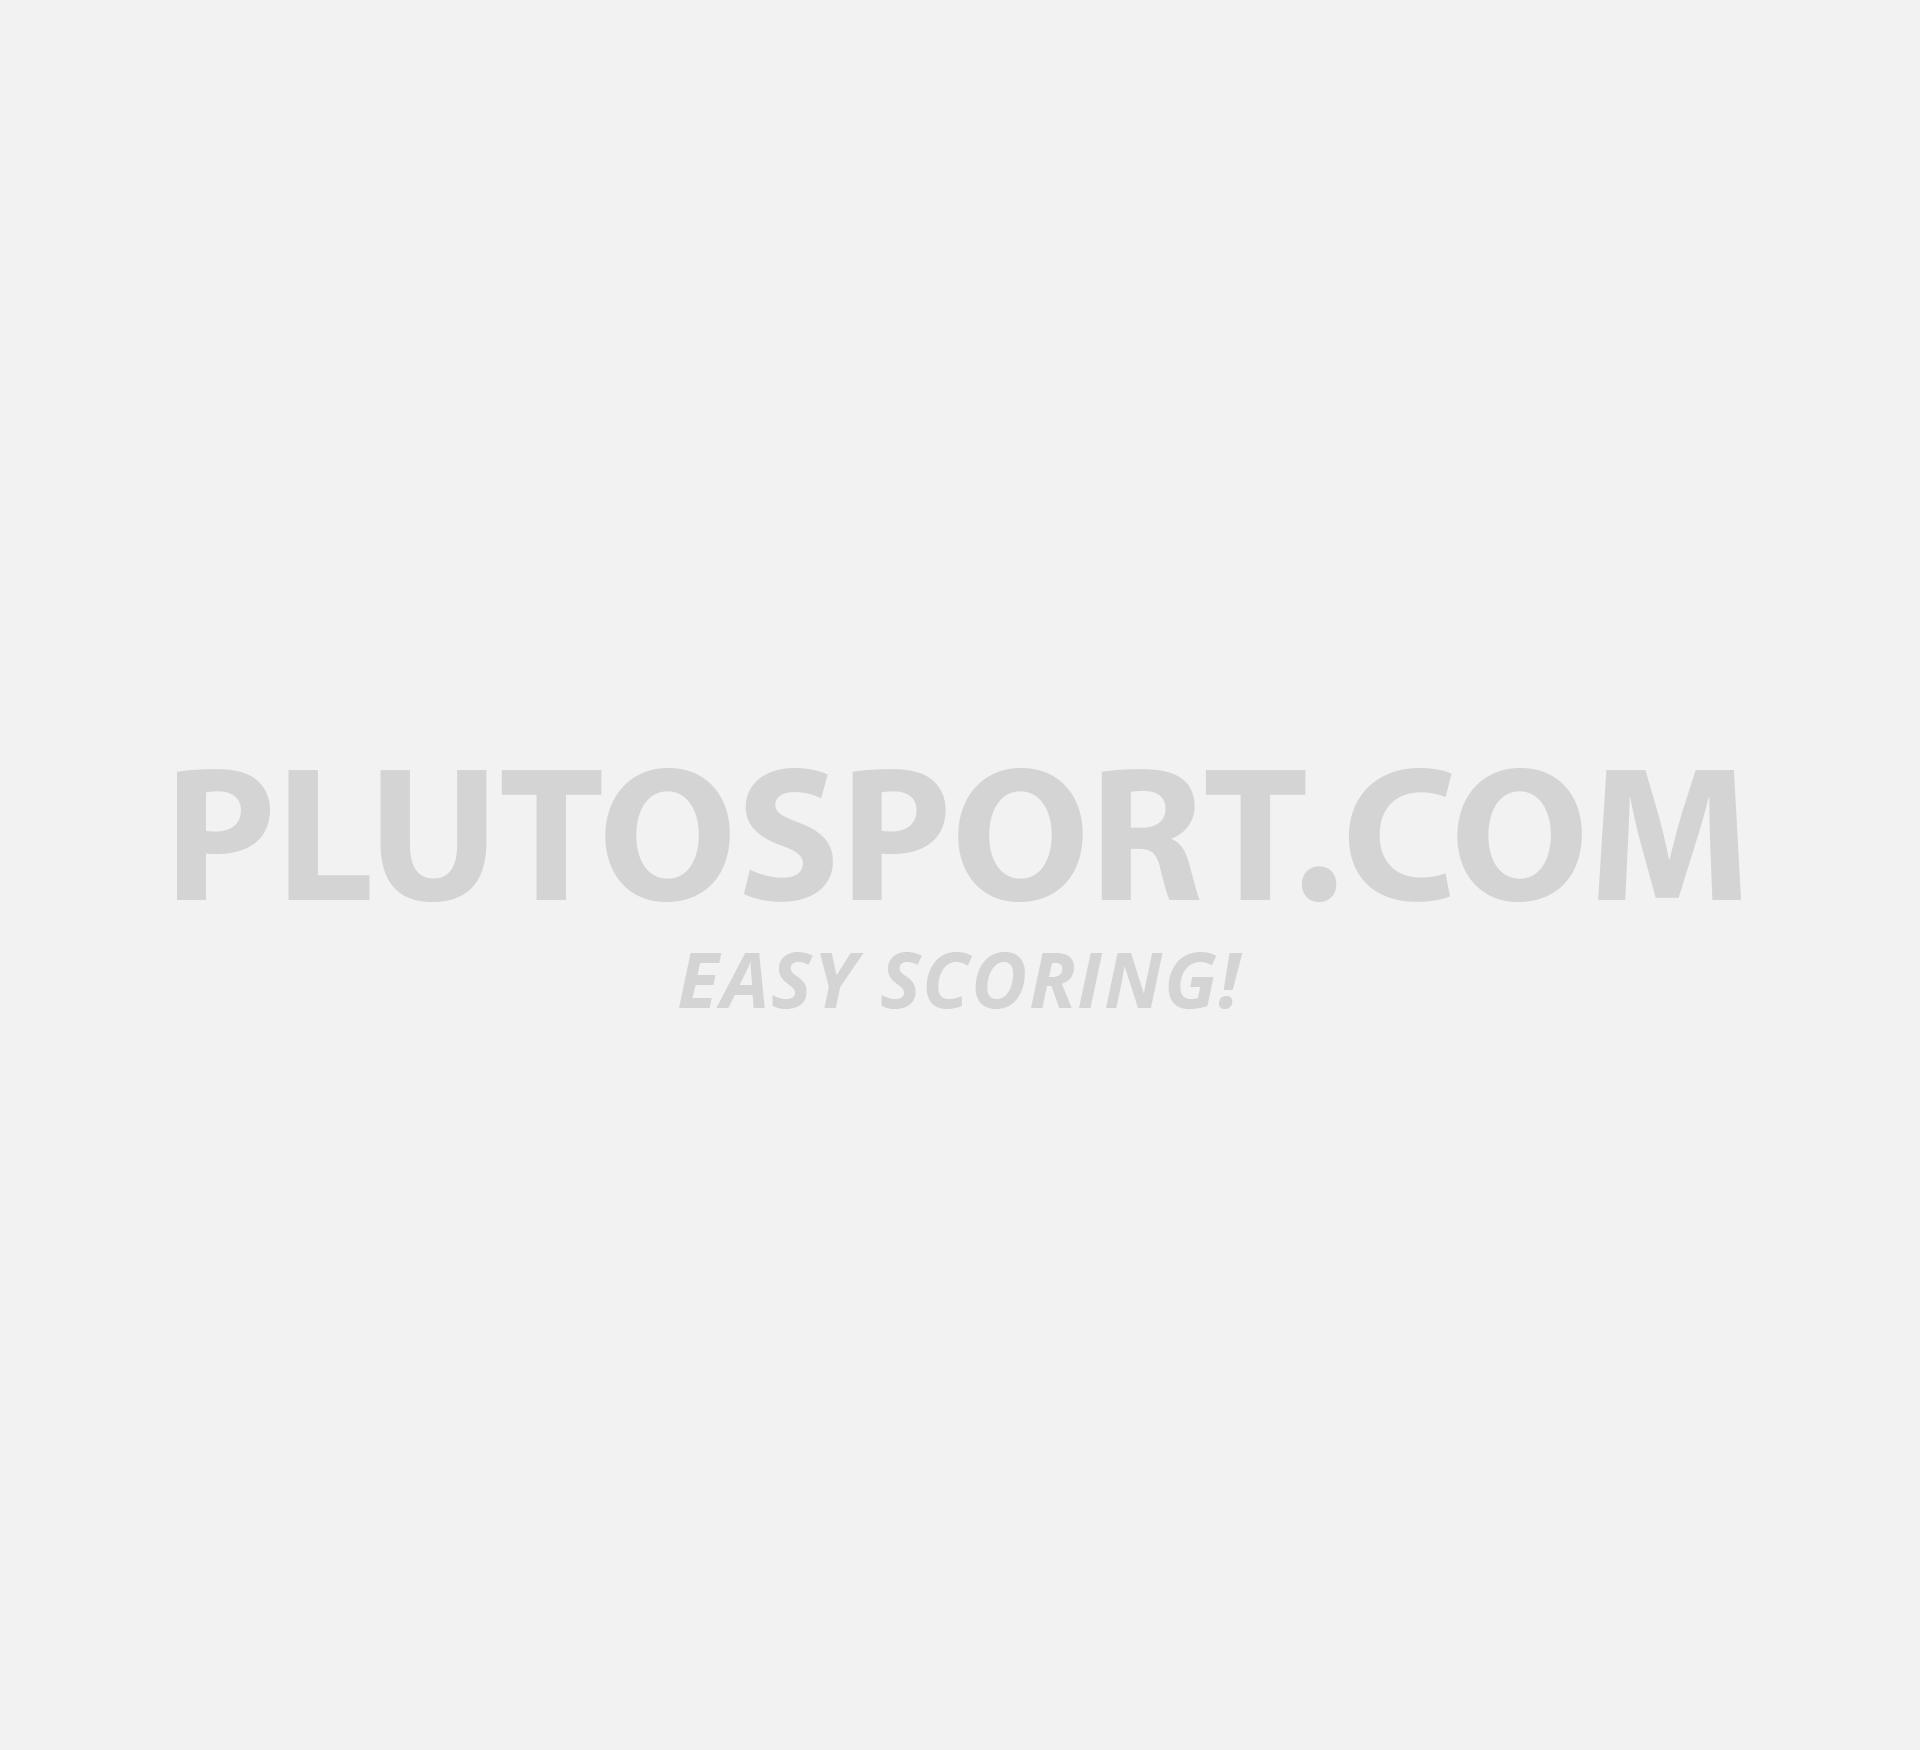 Tommy Hilfiger 1985 Wavy Flag Regular Polo Shirt Men